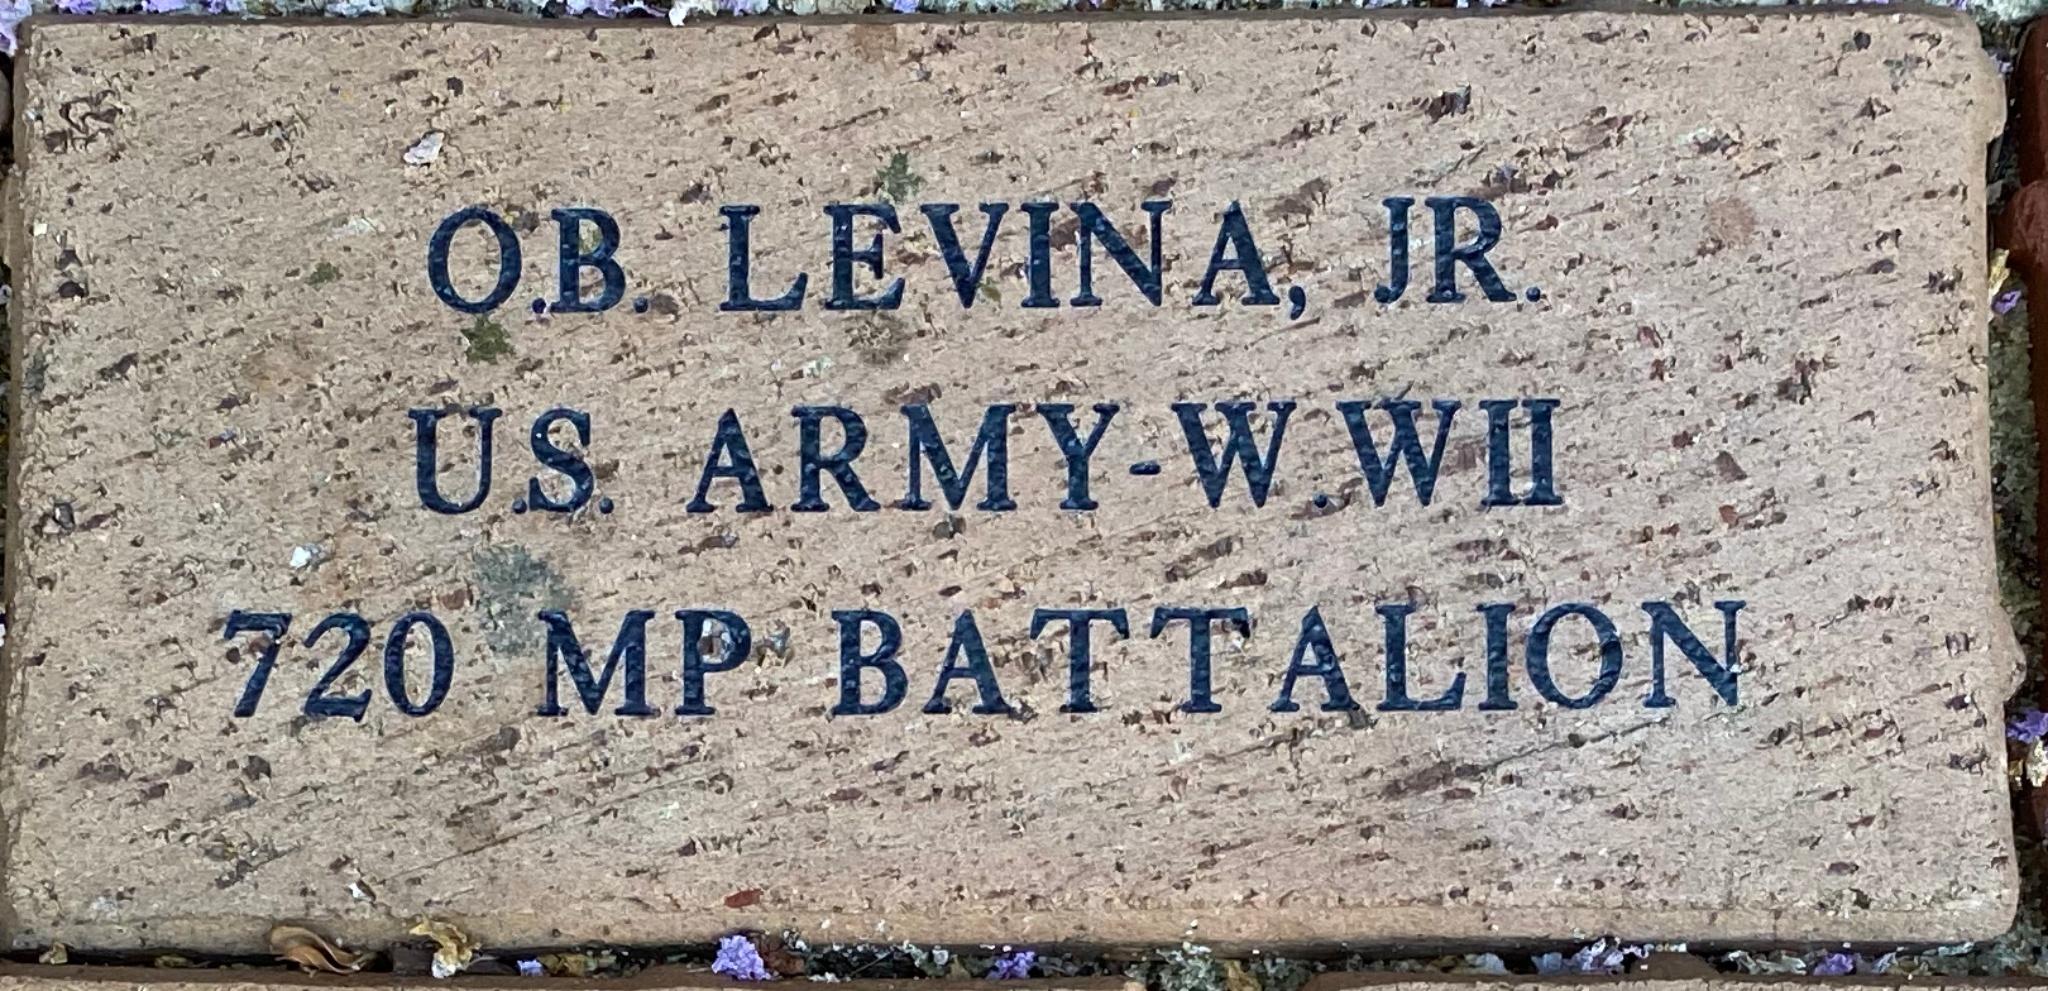 O.B. LEVINA JR. US ARMY WWII 720 MP BATTALION